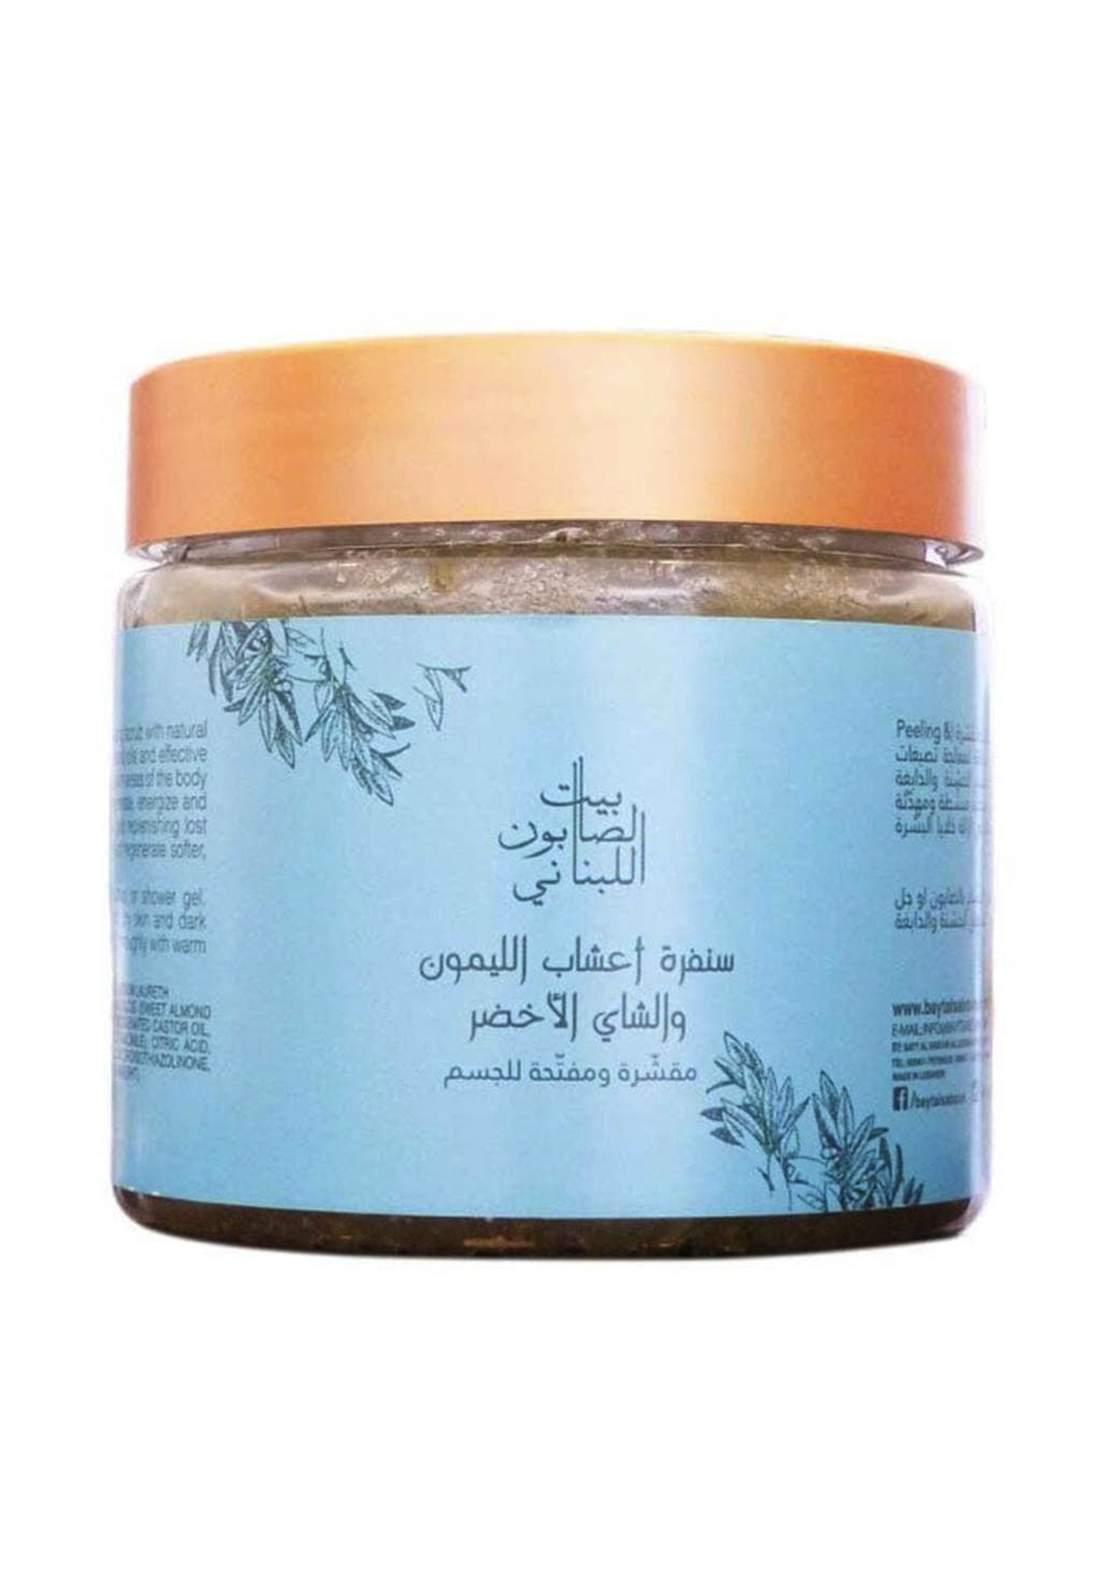 Bayt Alsaboun Alloubnani-320718 Body Sugar Scrub Lemongrass&Green Tea 500g مقشر